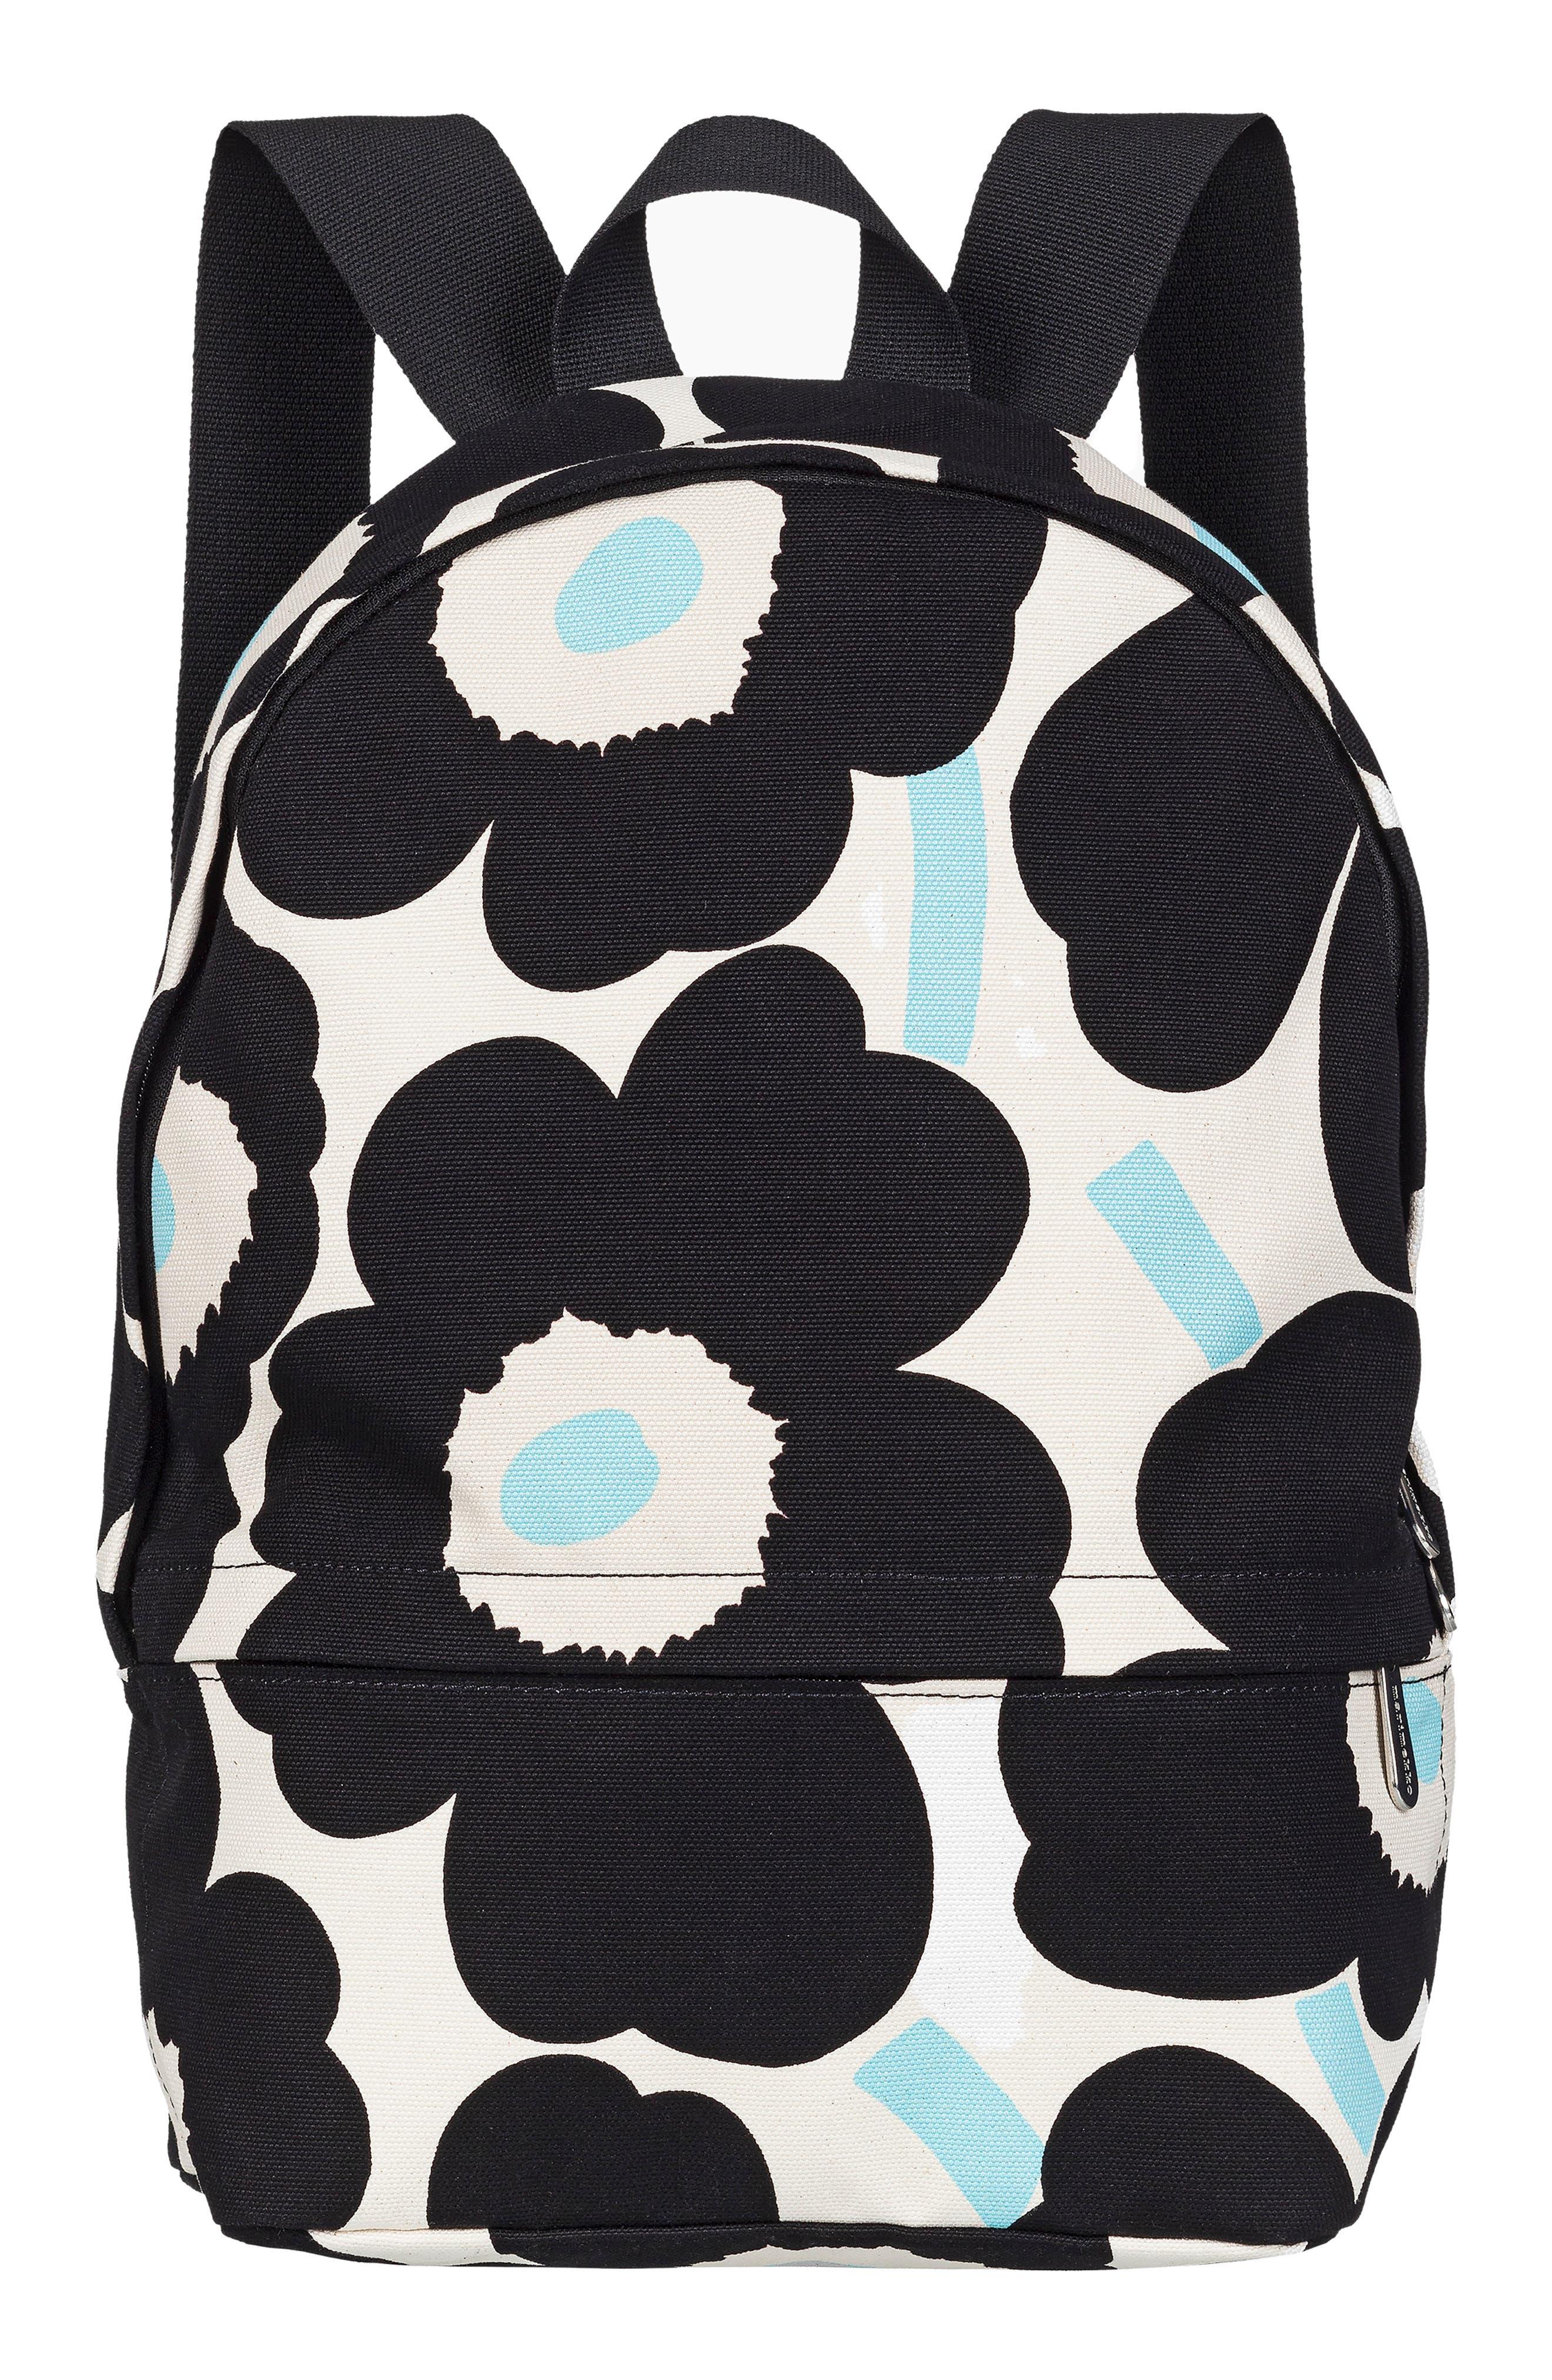 Enni Pieni Unikko Floral Print Canvas Backpack